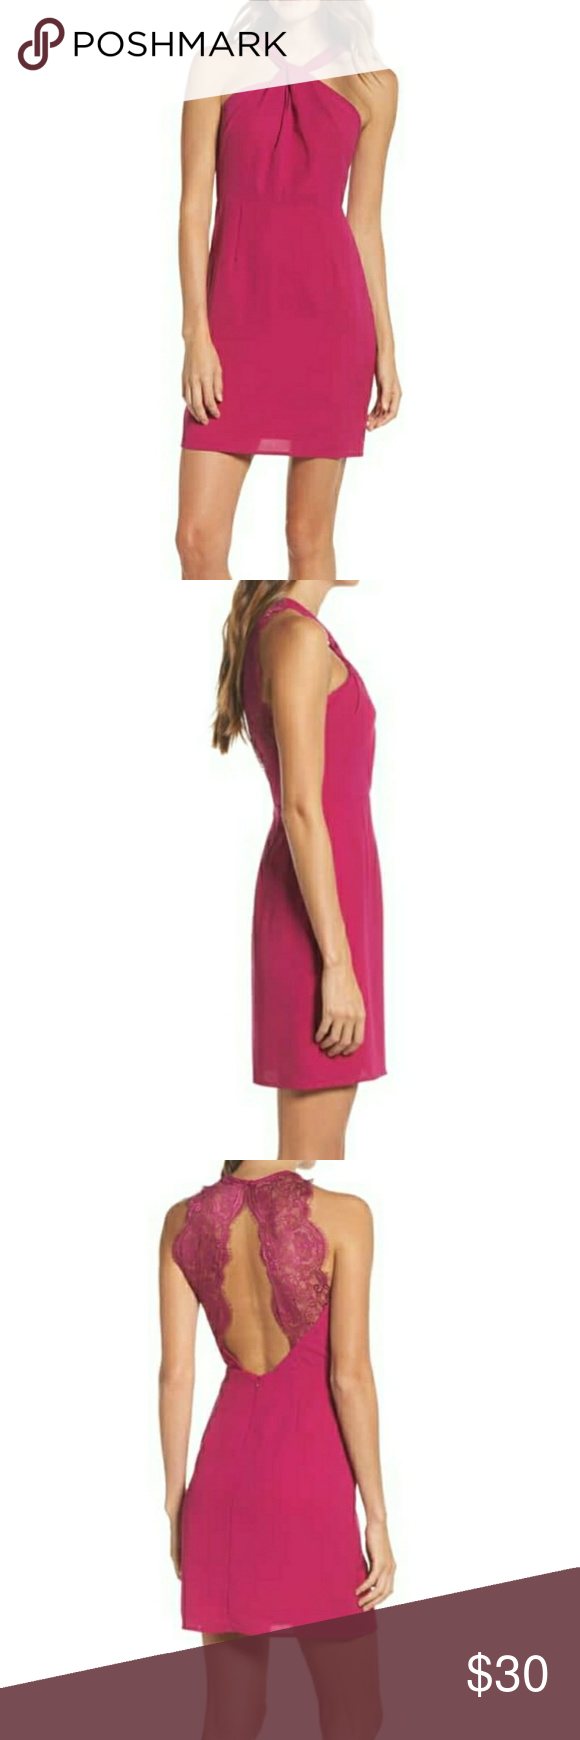 Nwt 19 Cooper Lace Back Sheath Dress Boutique My Posh